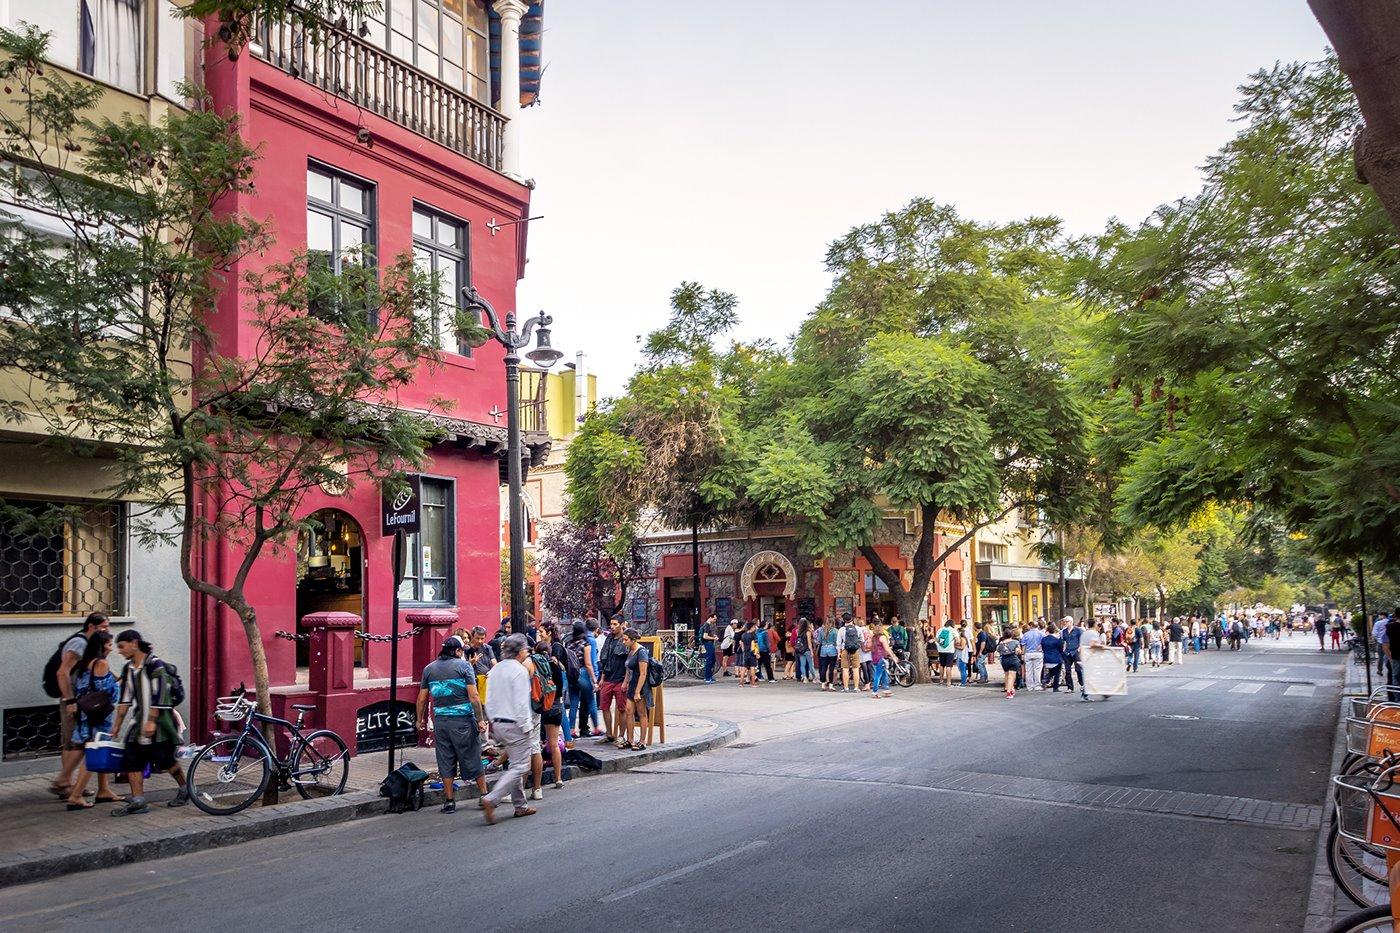 barrio-lastarria---istock2. Barrio Lastarria